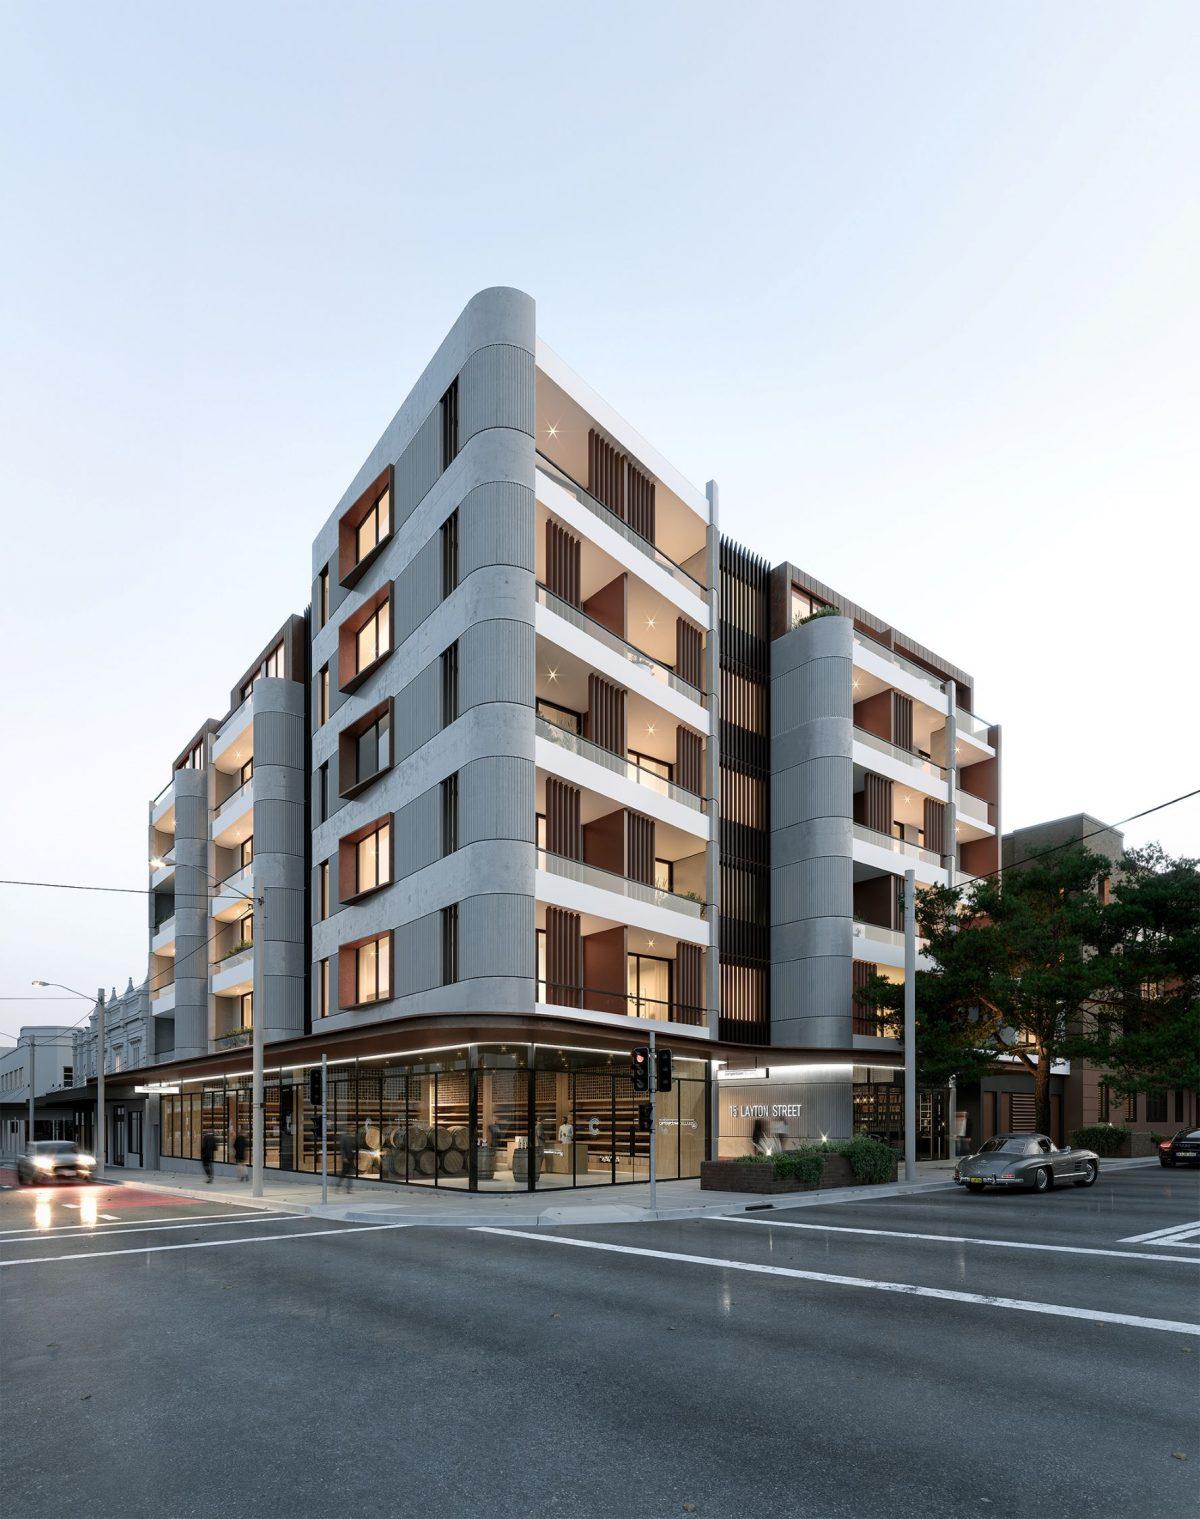 Parramatta Road, Camperdown